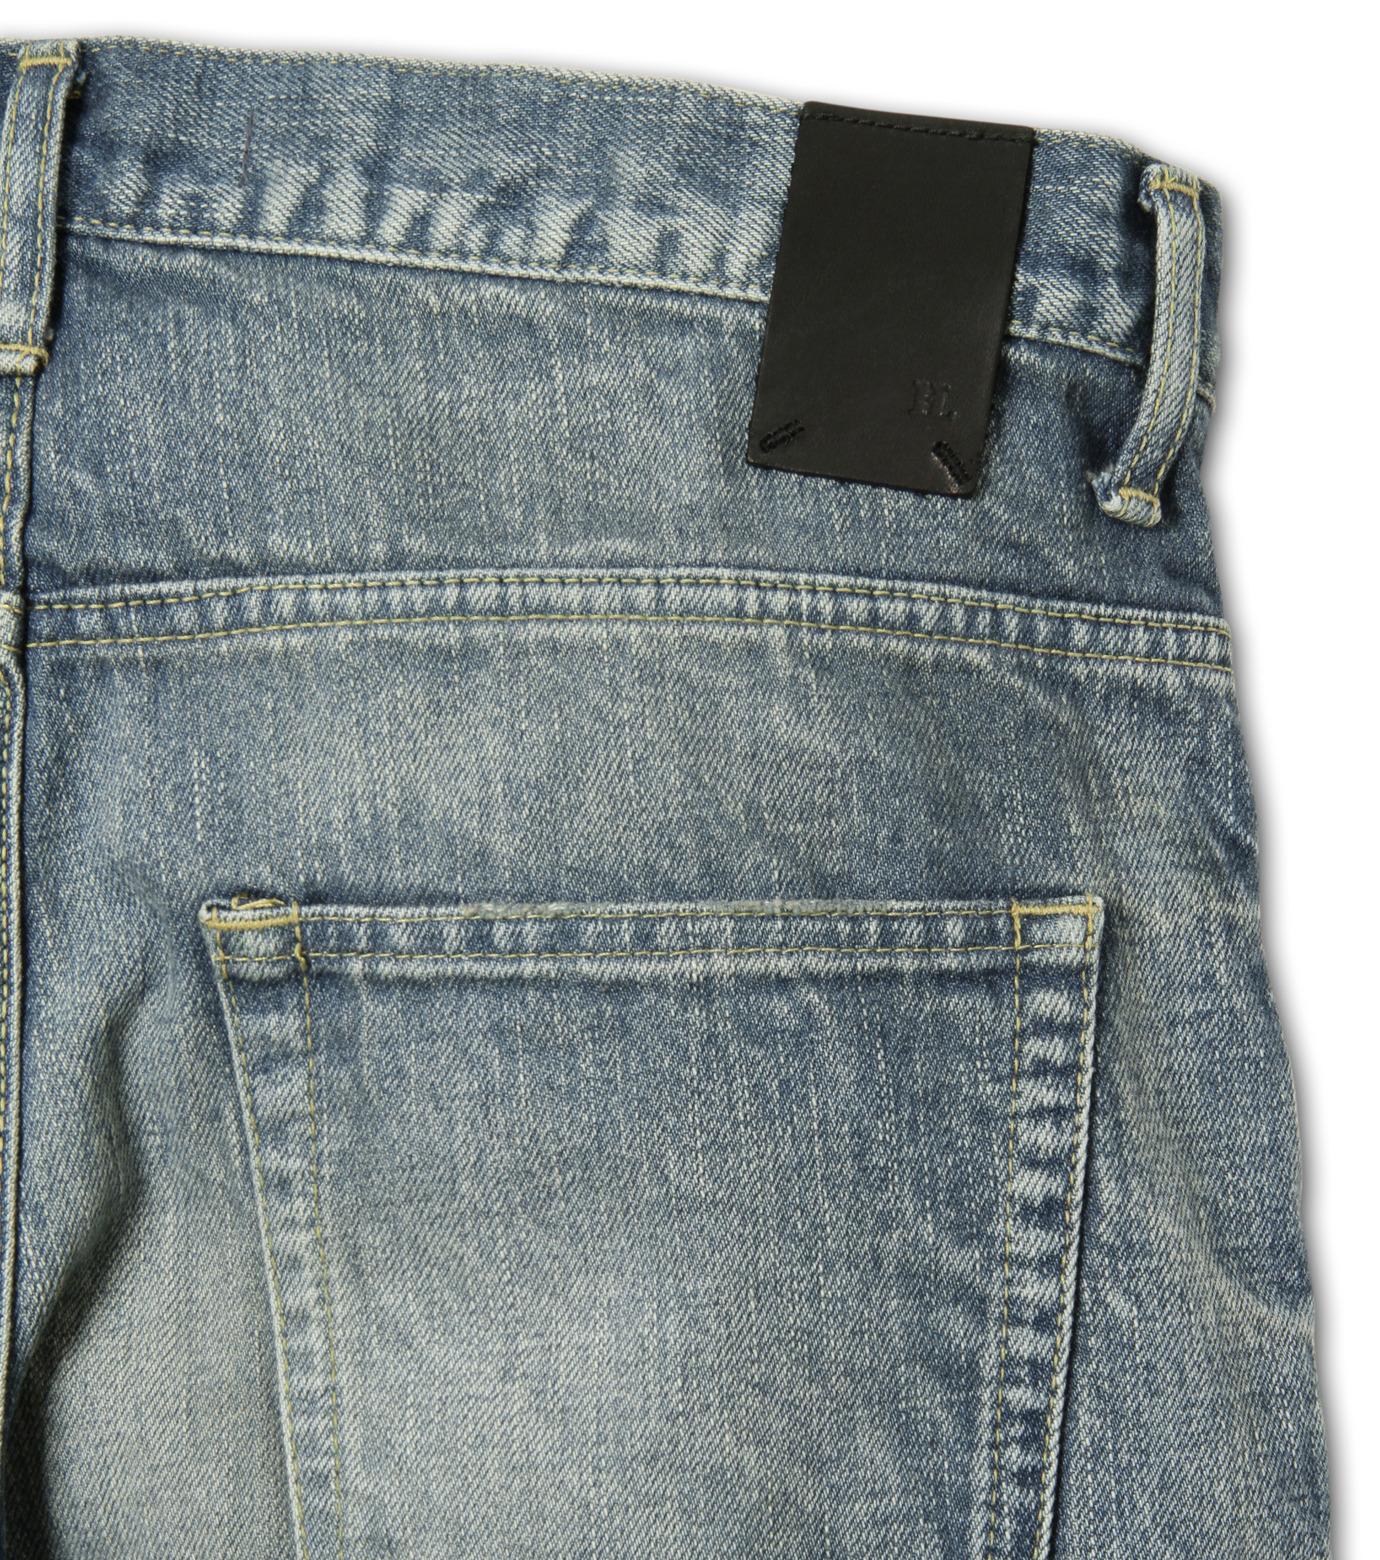 HL HEDDIE LOVU(エイチエル・エディールーヴ)のDamage Denim PT-BLUE(パンツ/pants)-17S98003-92 拡大詳細画像8